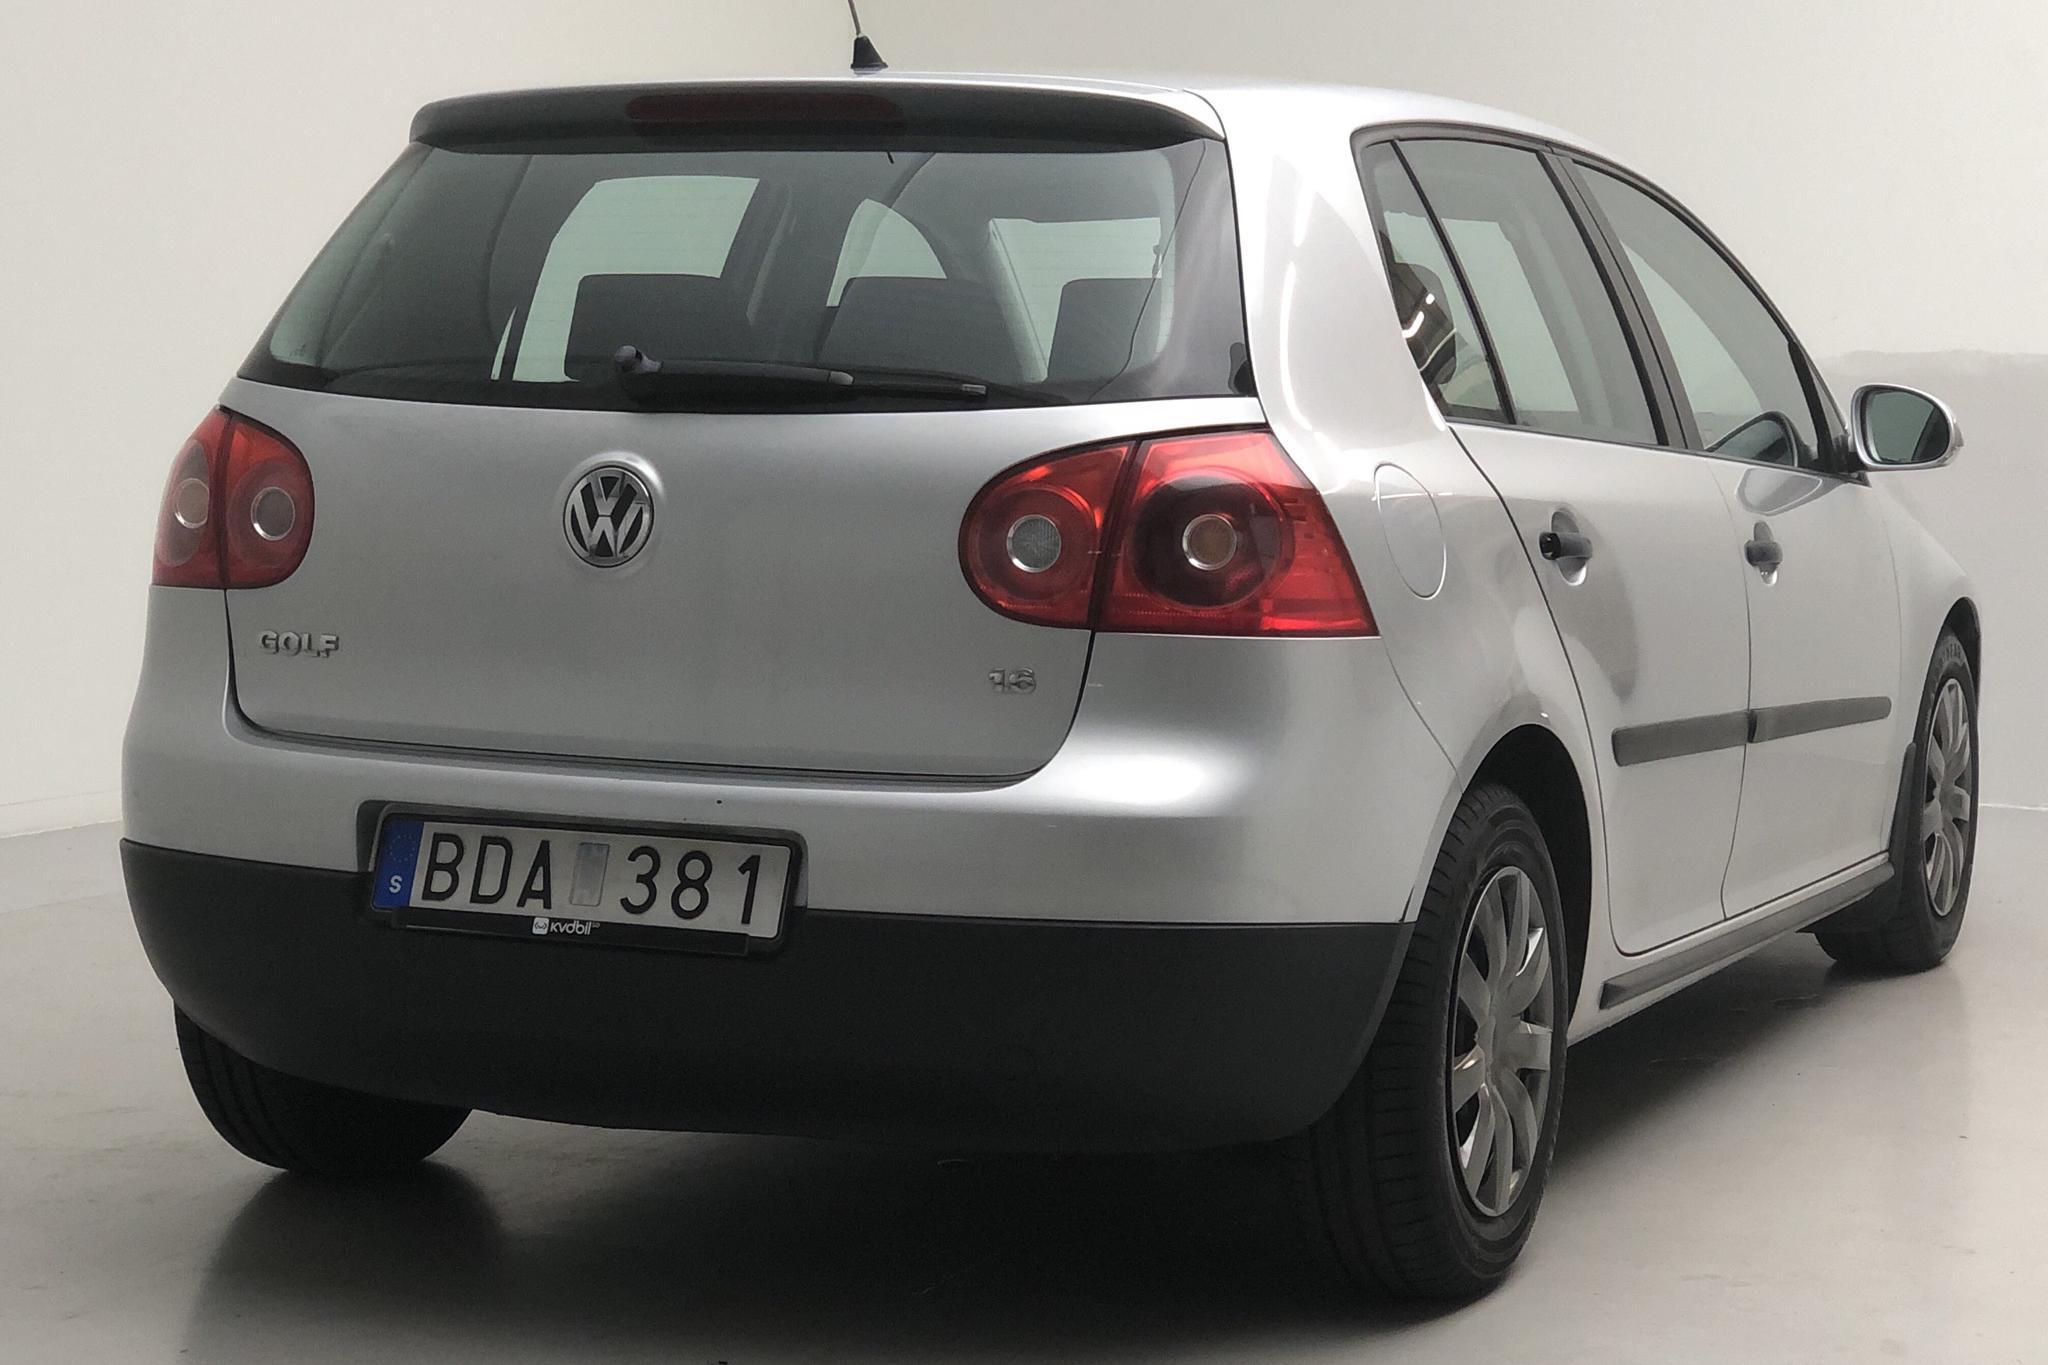 VW Golf A5 1.6 5dr (102hk) - 12 074 mil - Manuell - silver - 2006